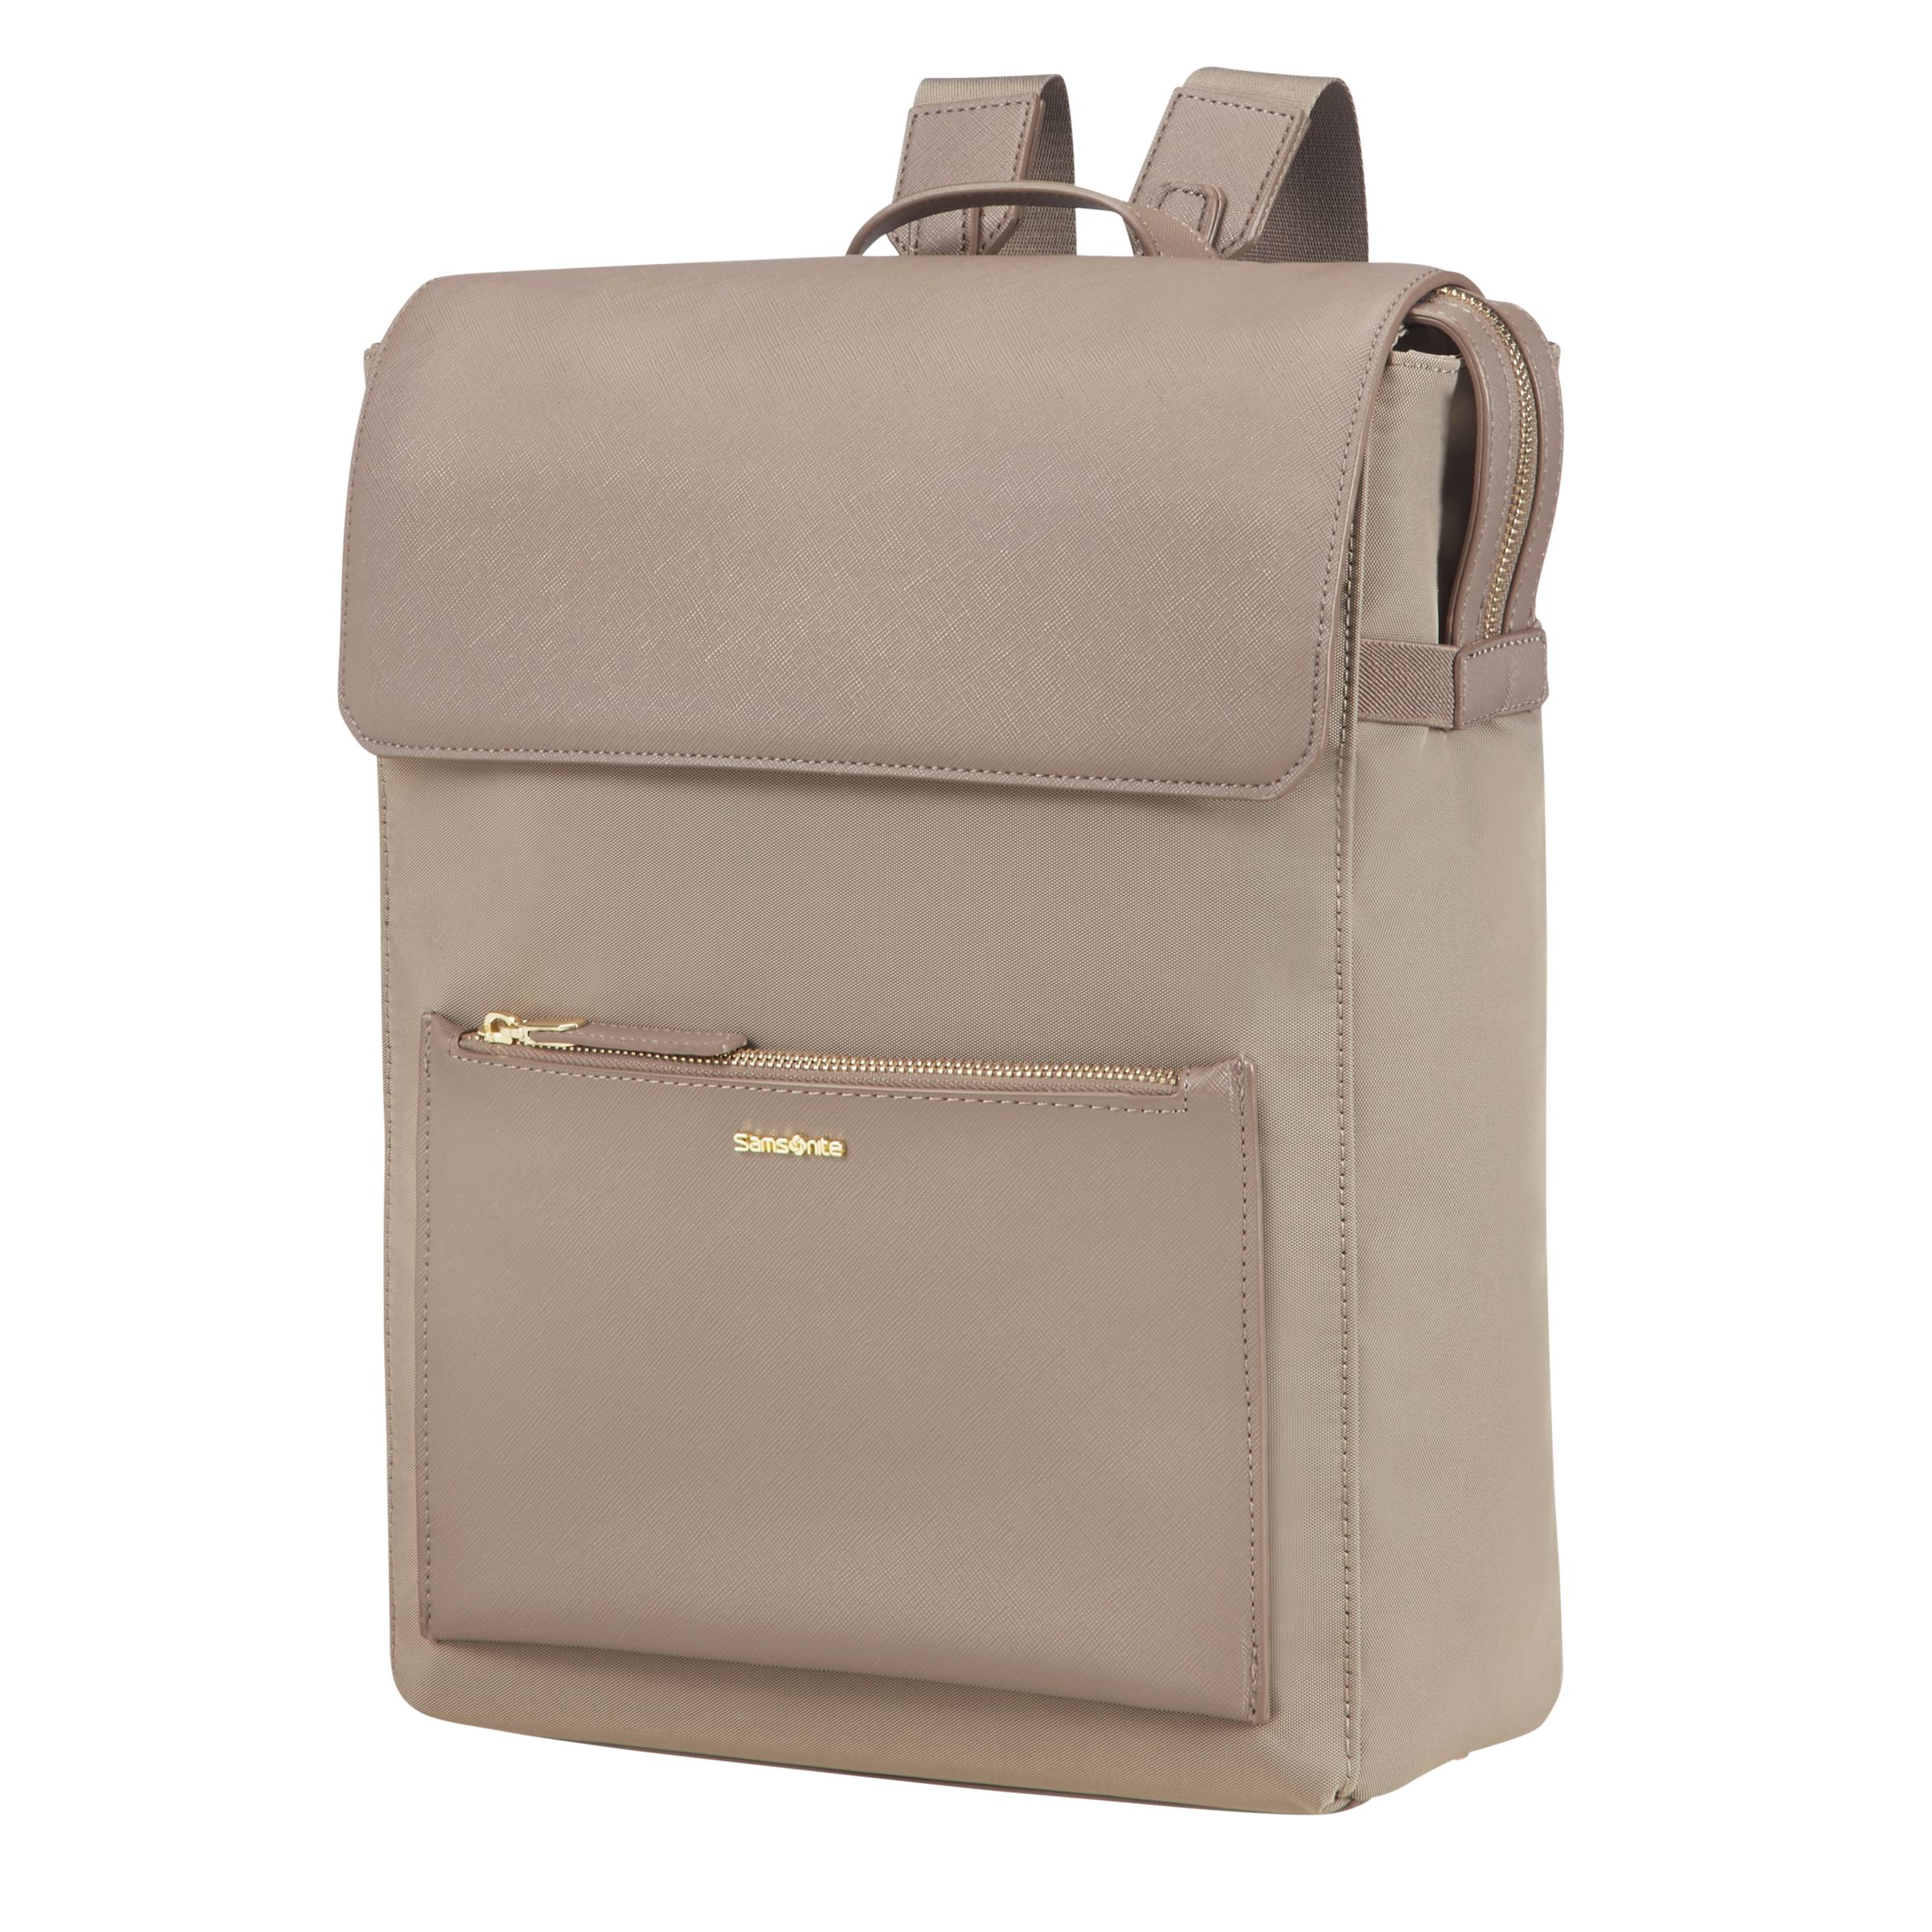 Samsonite Samonsite W Zalia Rangle 14.1 Backpack, Beige